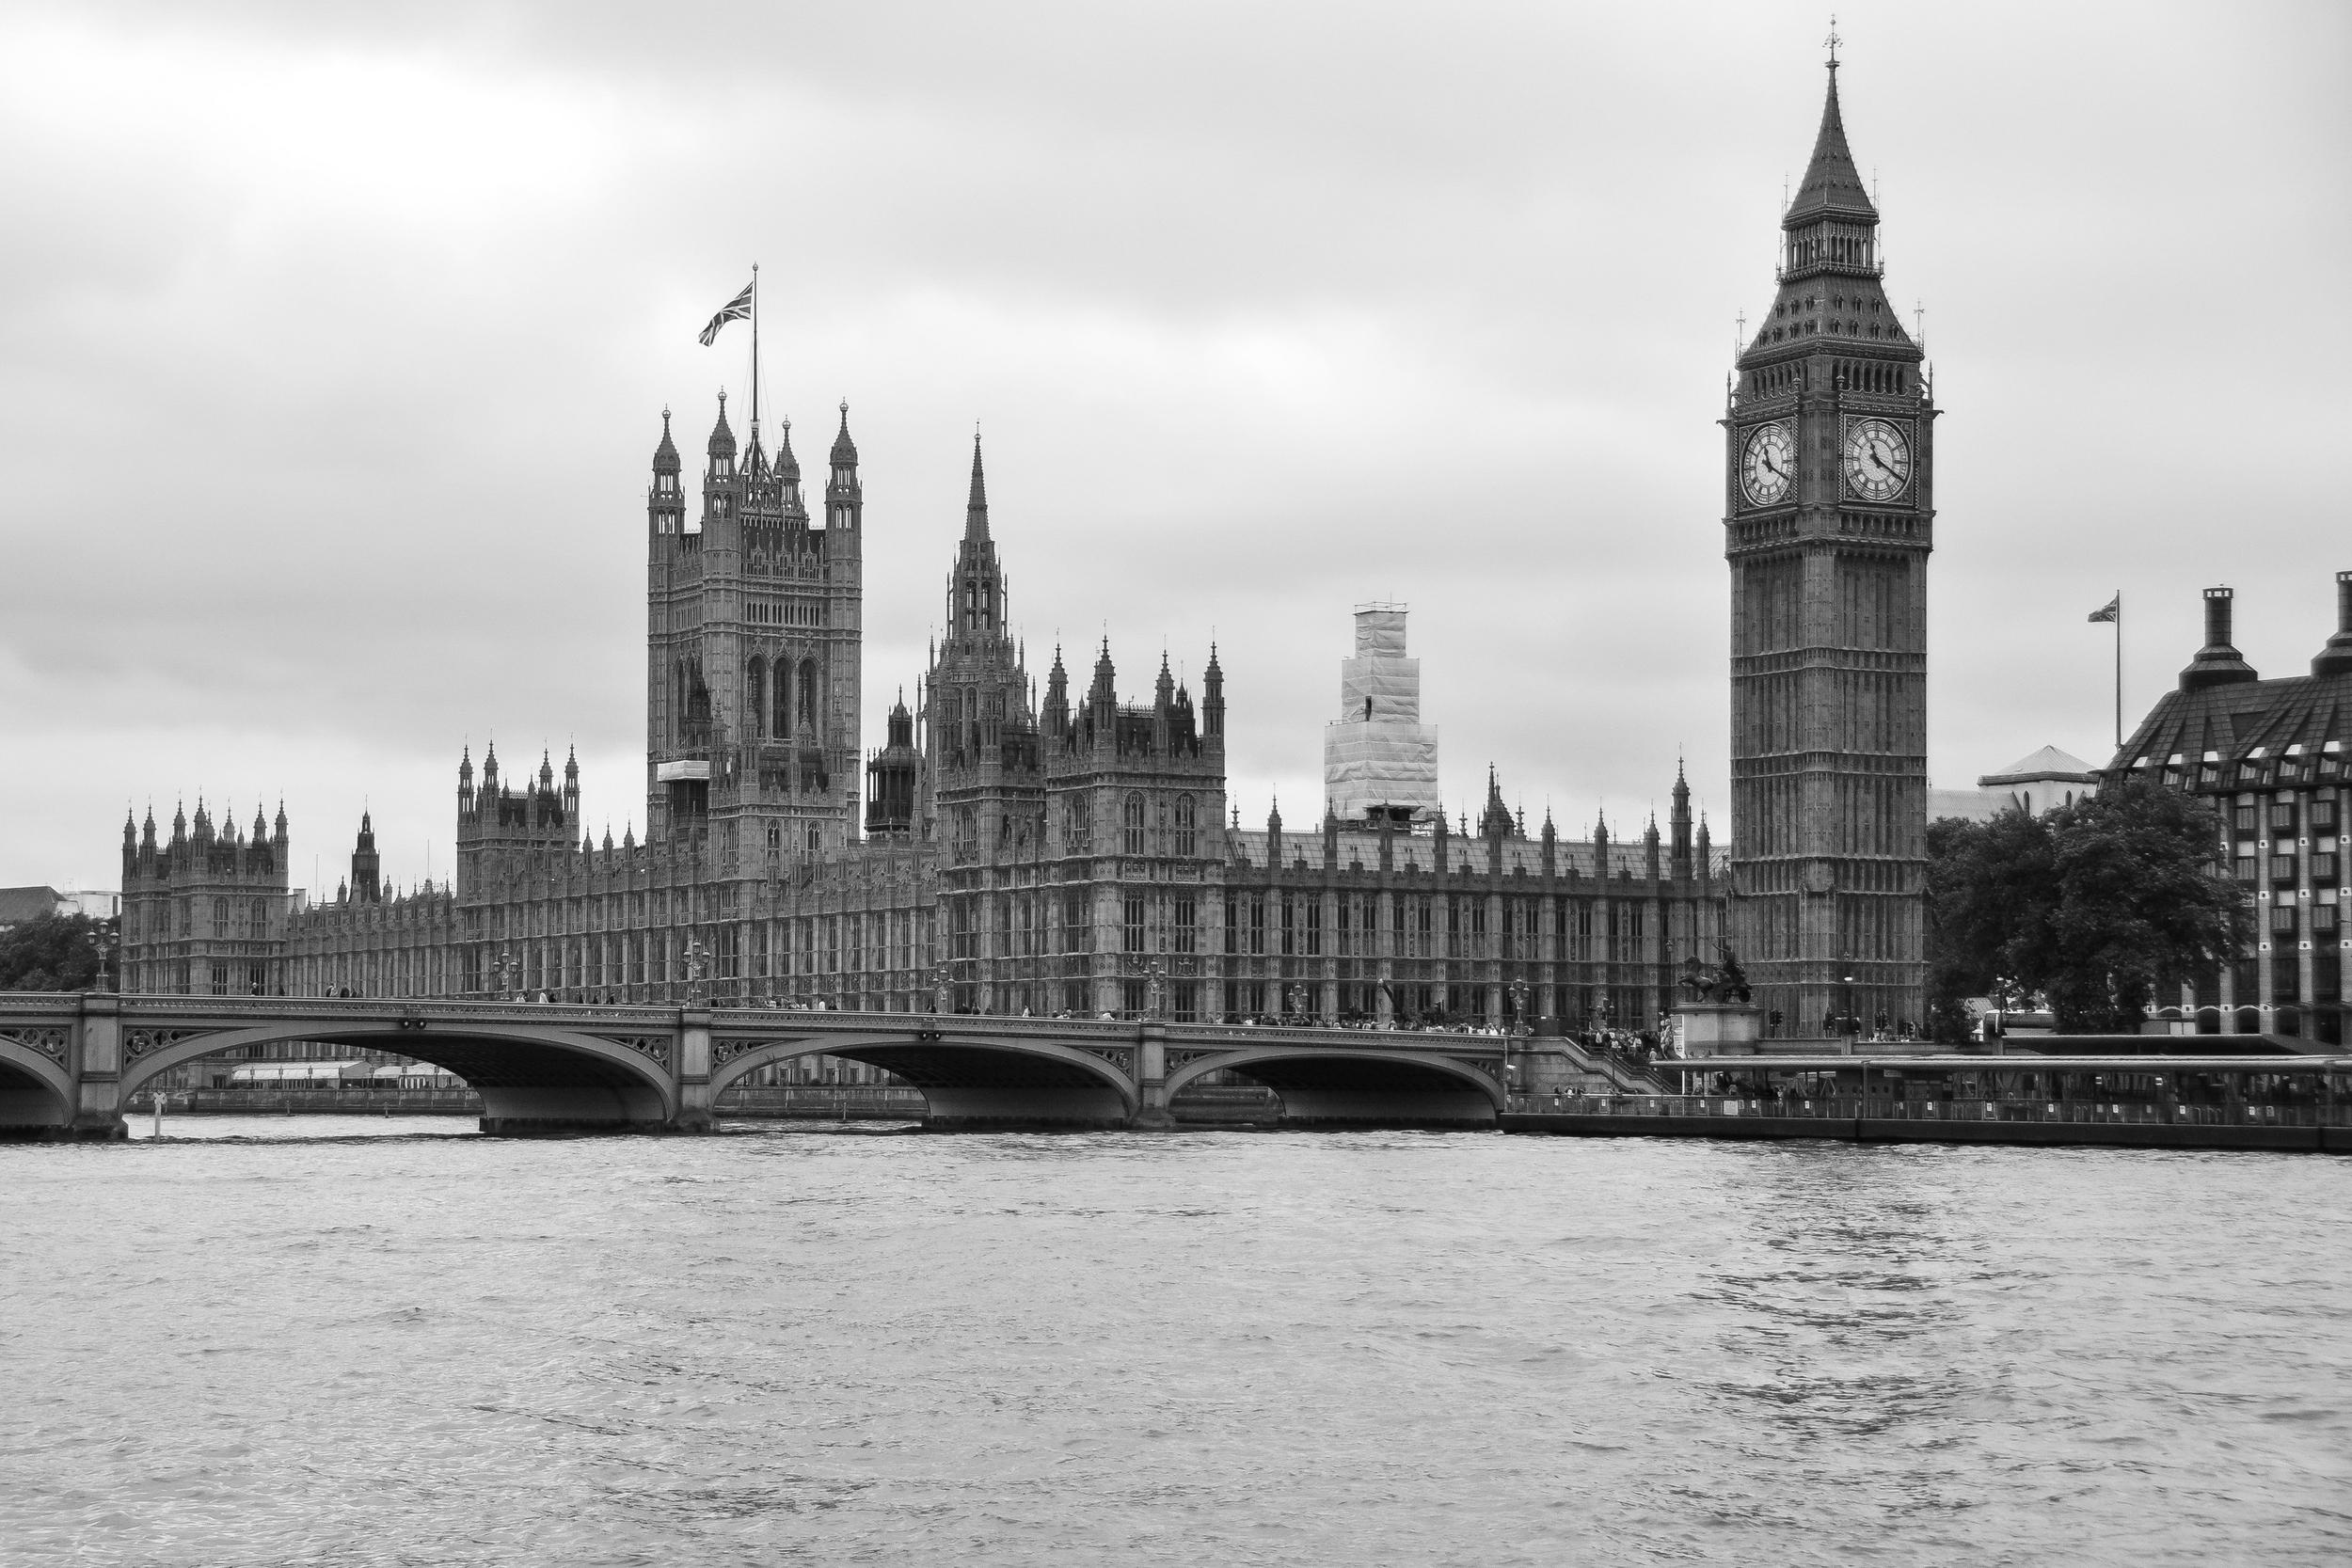 English Parliament (London, England)